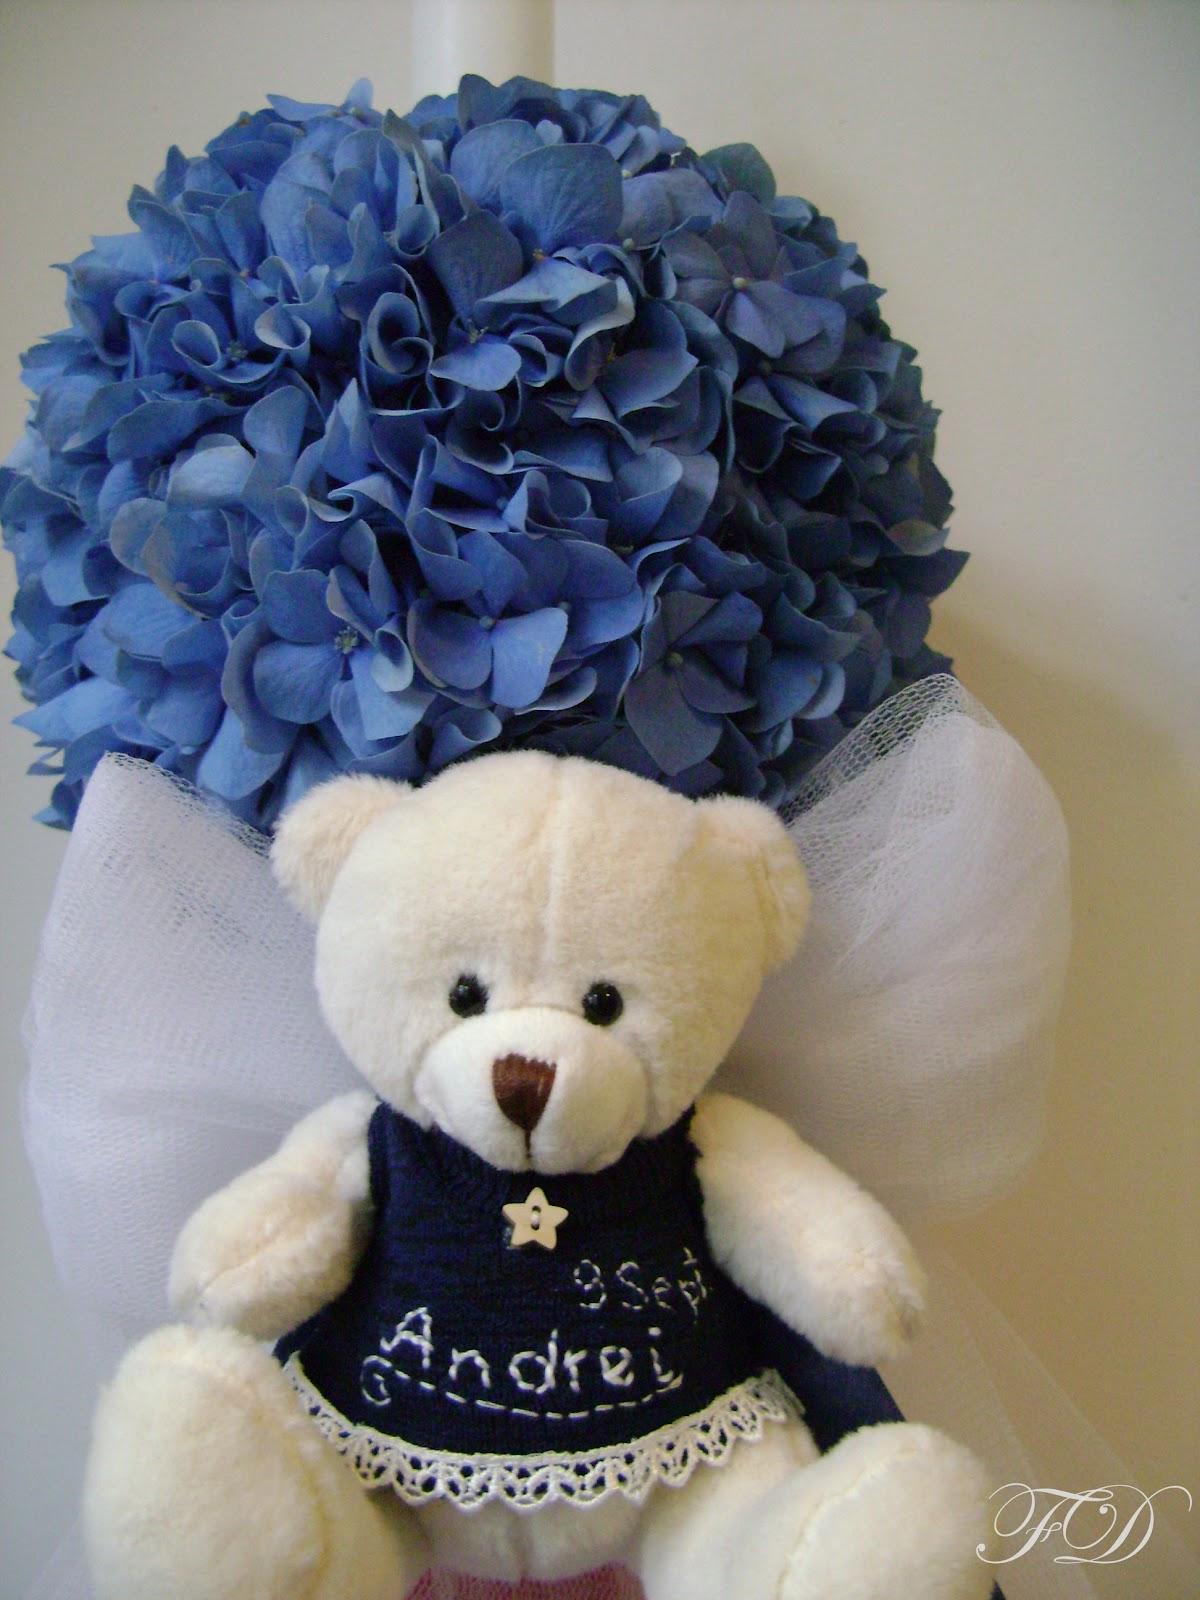 flower decor mini lumanare hortensie albastra funda bleumarin si tull alb varianta urs. Black Bedroom Furniture Sets. Home Design Ideas